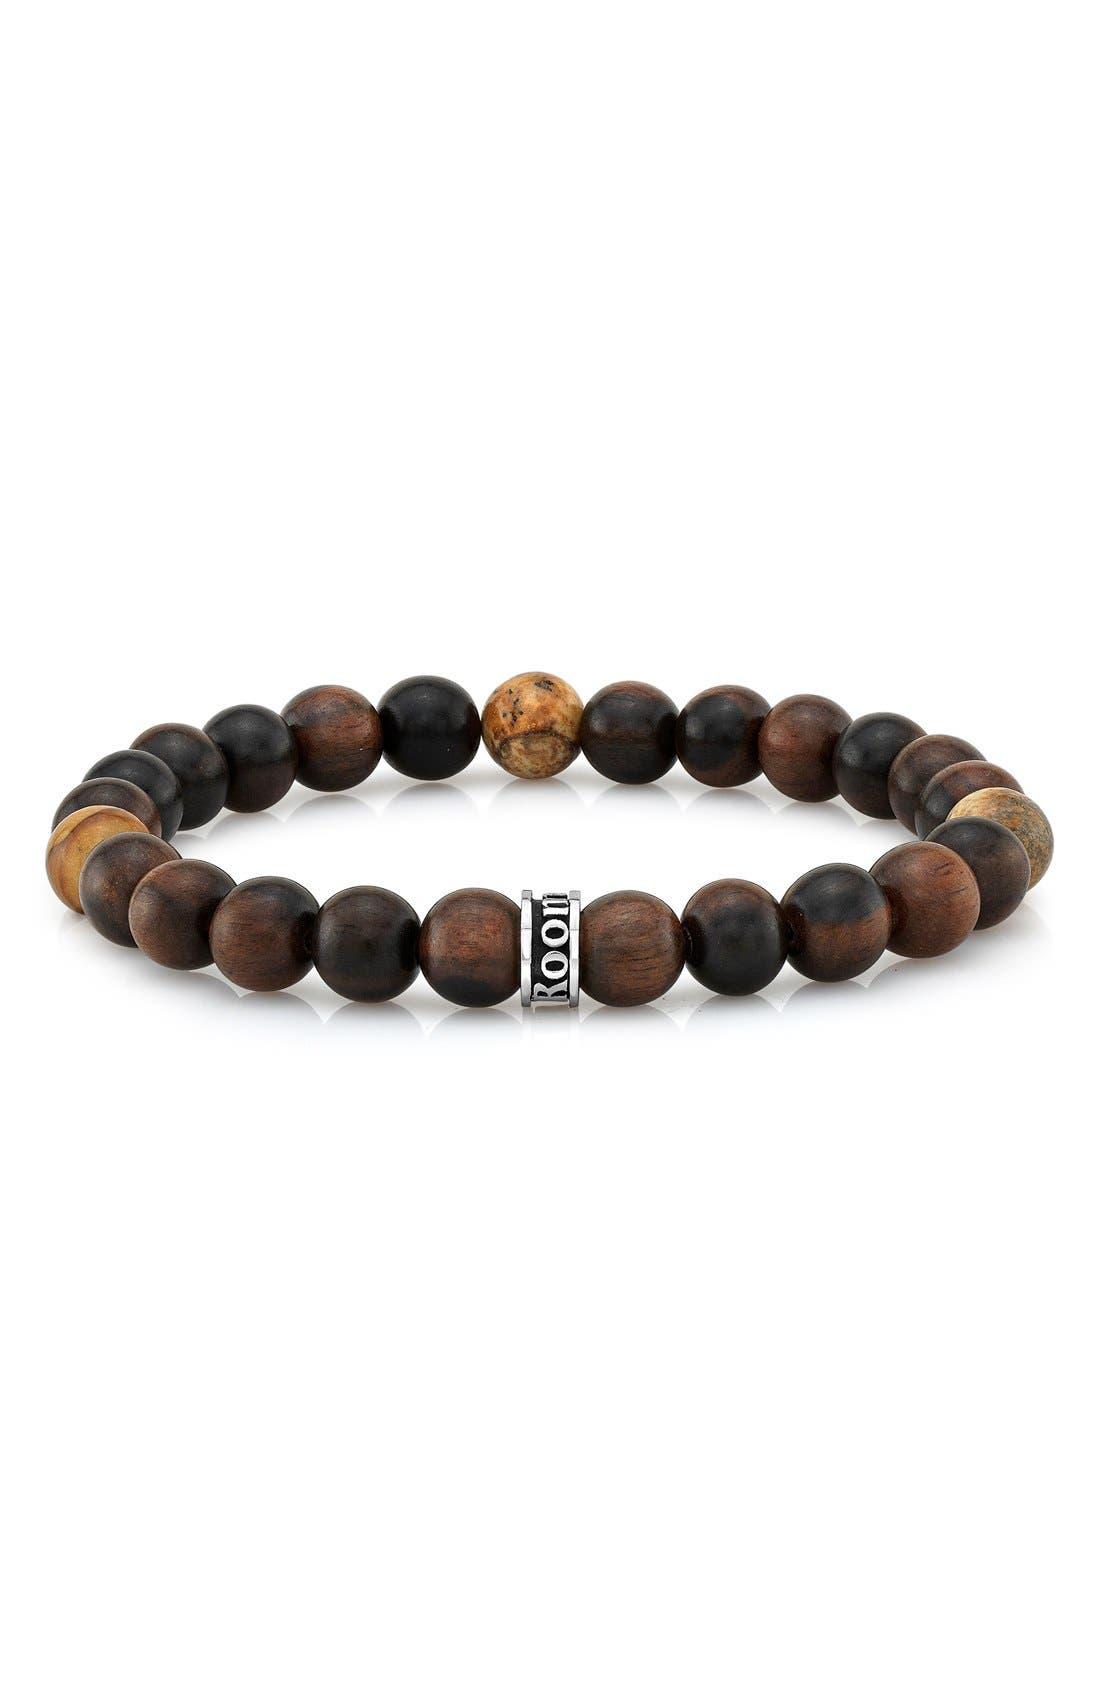 Room101 Wood & Agate Bead Stretch Bracelet